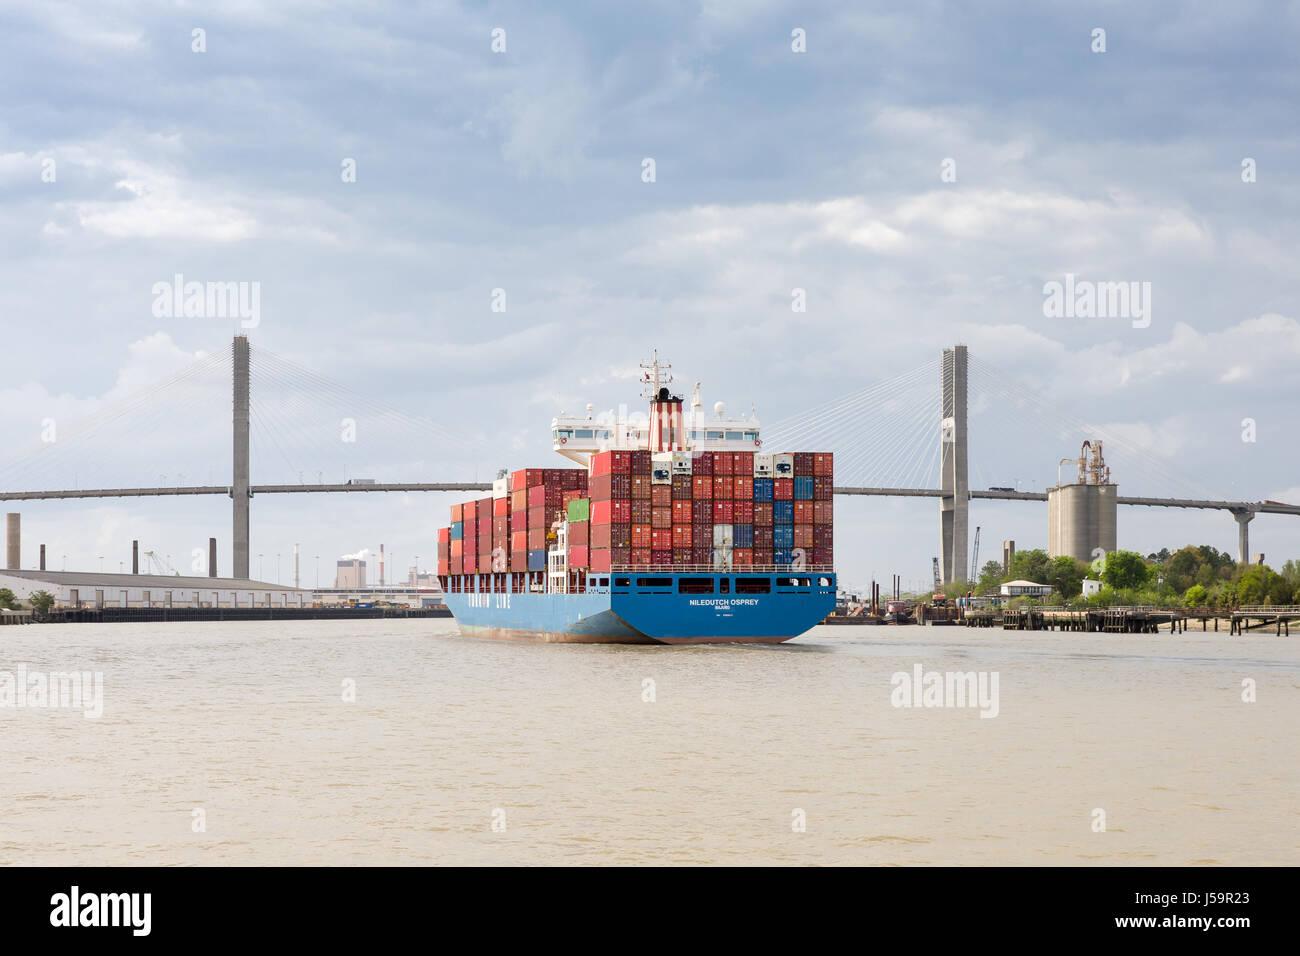 Savannah, GA - March 27, 2017:  Container ship approaching the Talmadge Memorial Bridge on the Savannah River as - Stock Image